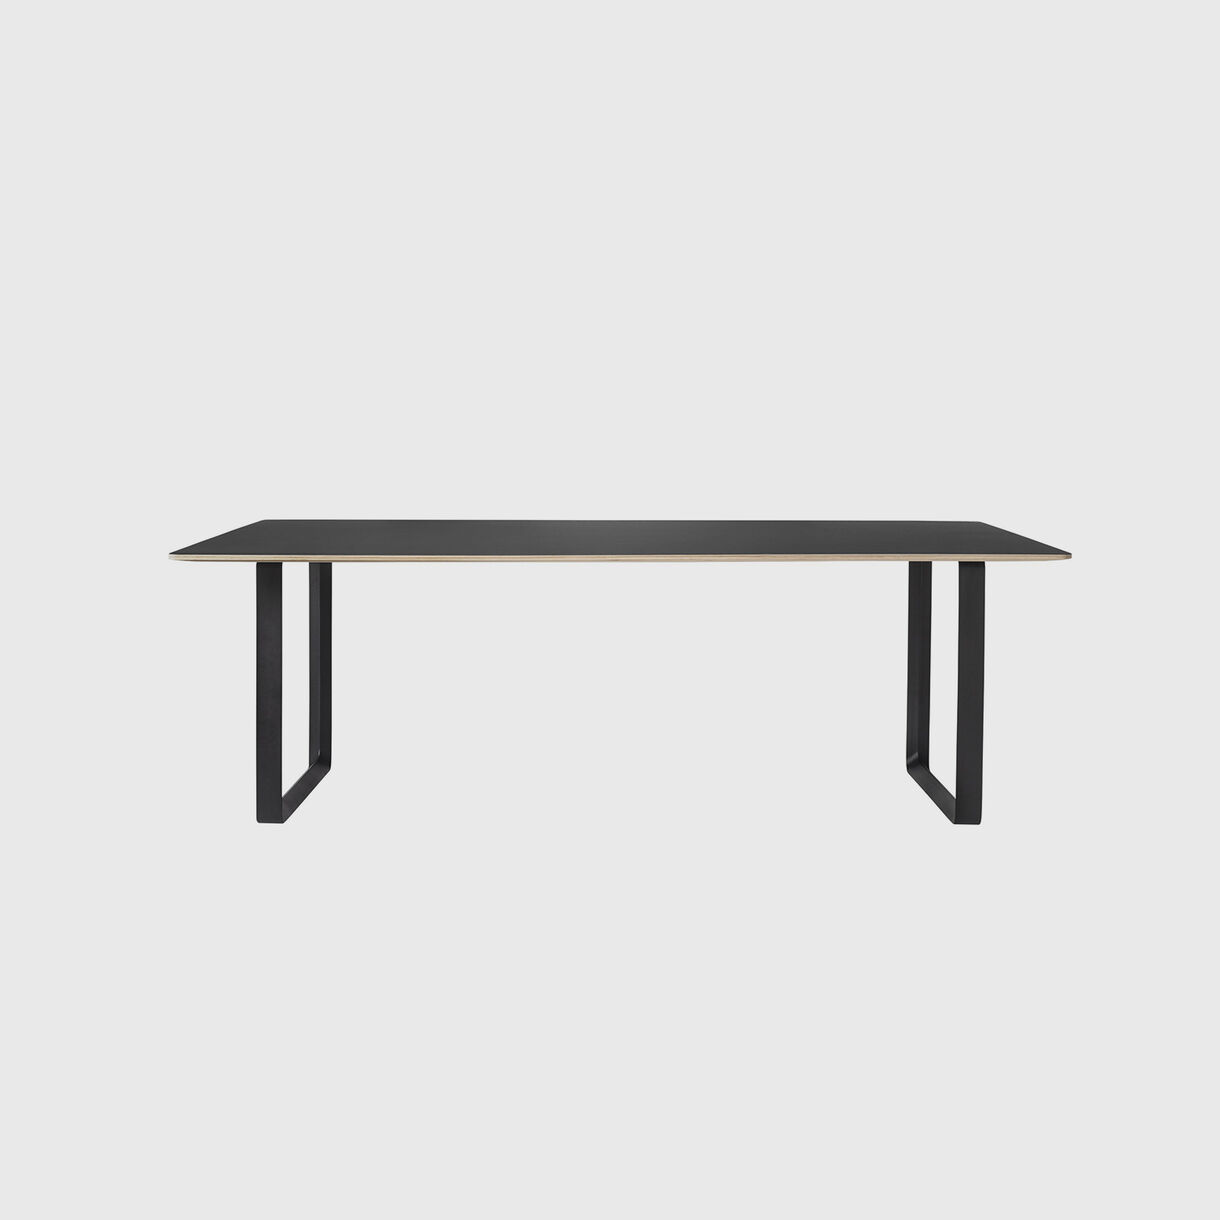 70/70 Table, 2250 x 900, Black